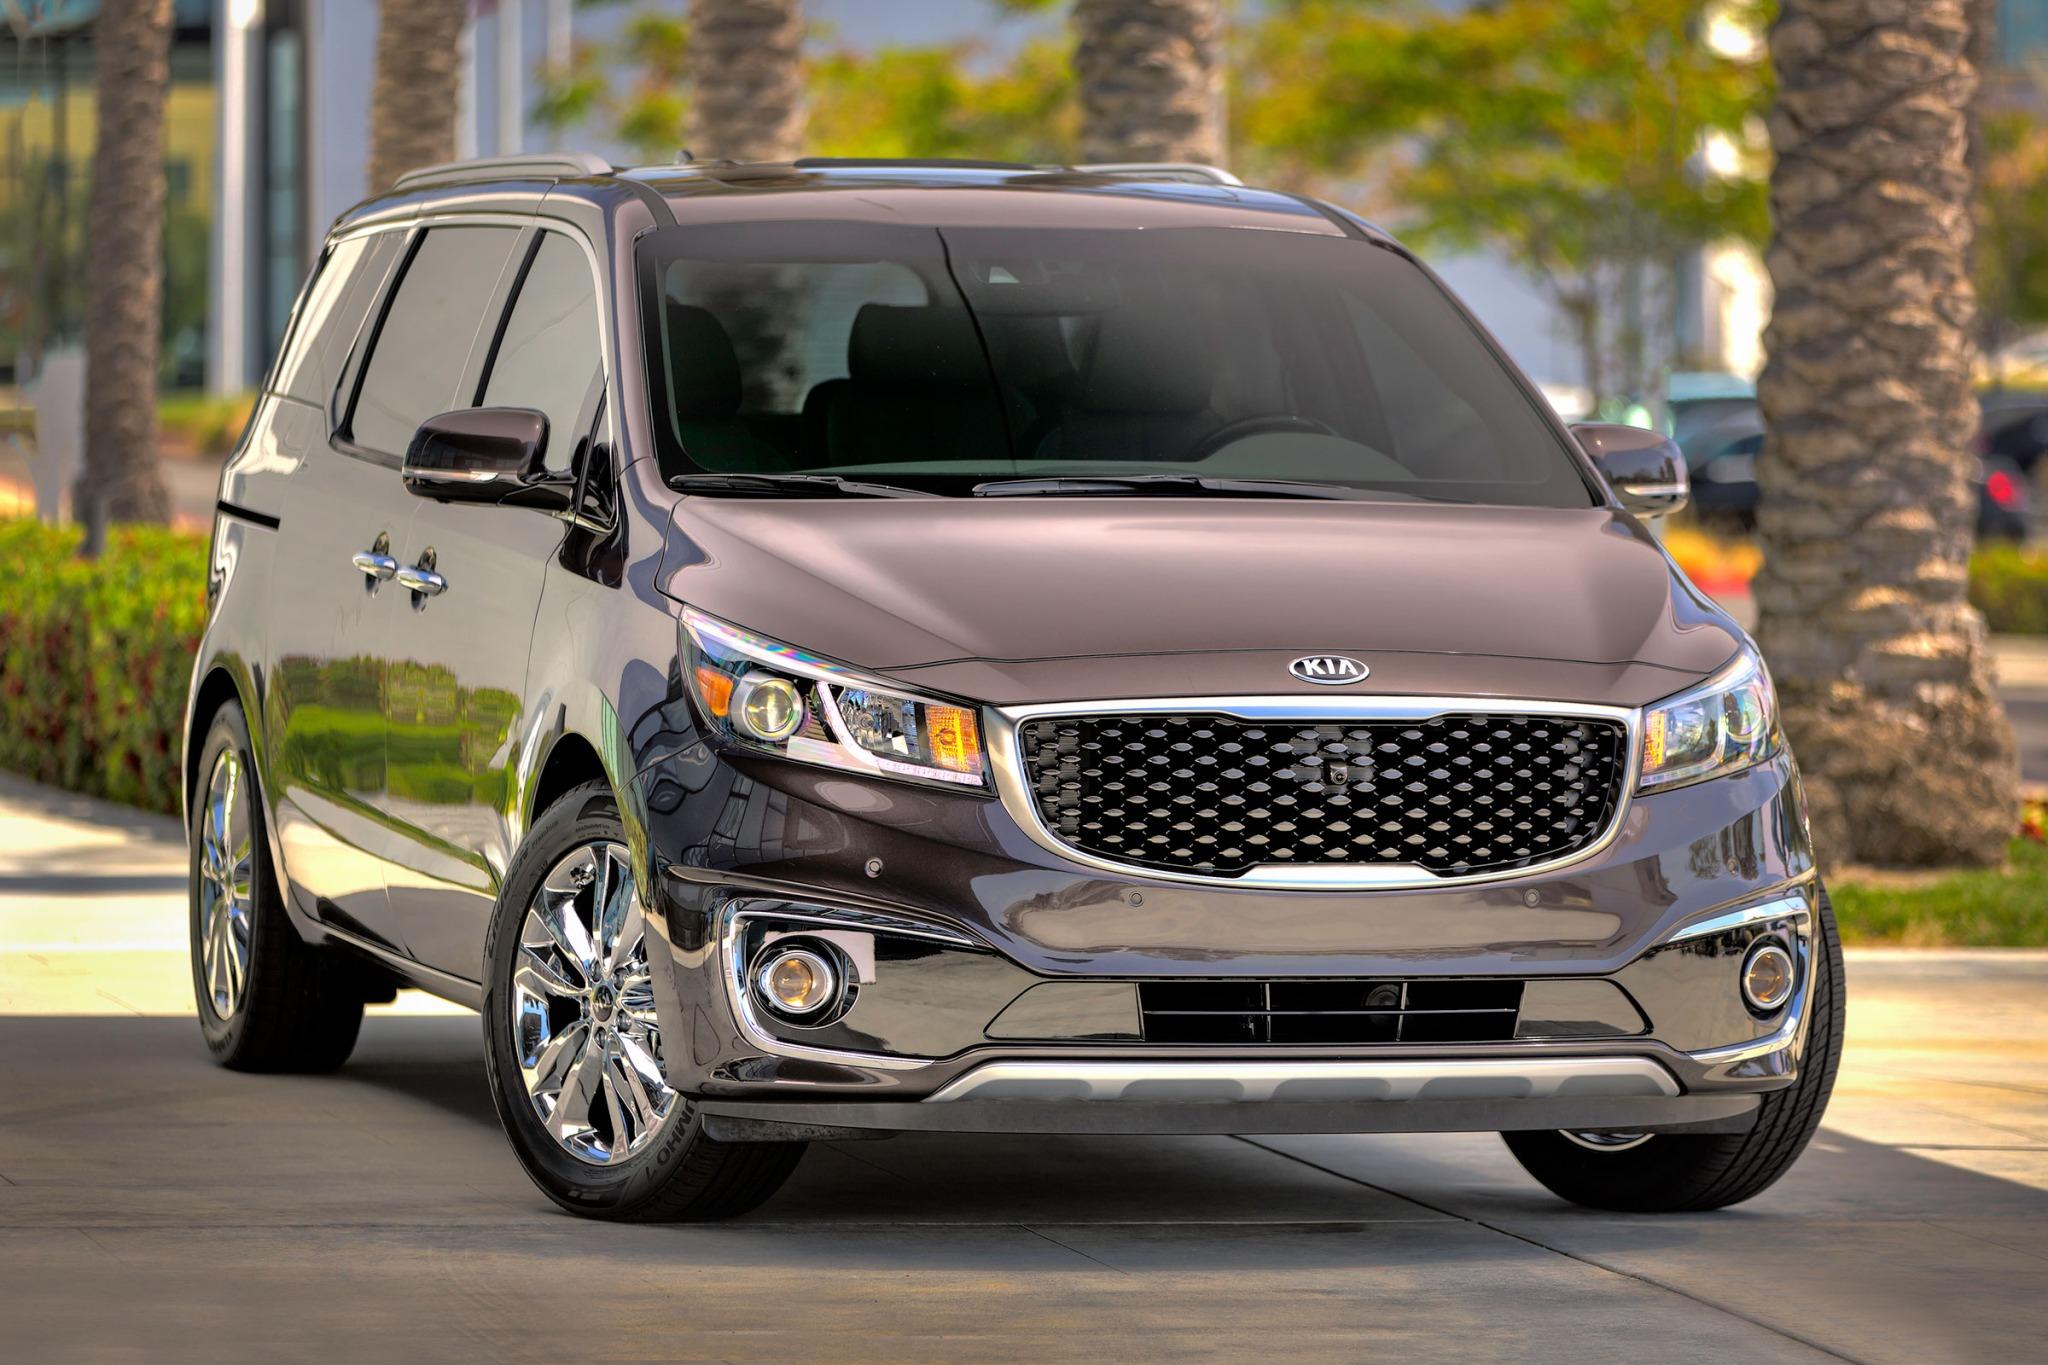 2017 kia sedona passenger minivan sx limited fq oem 1 2048